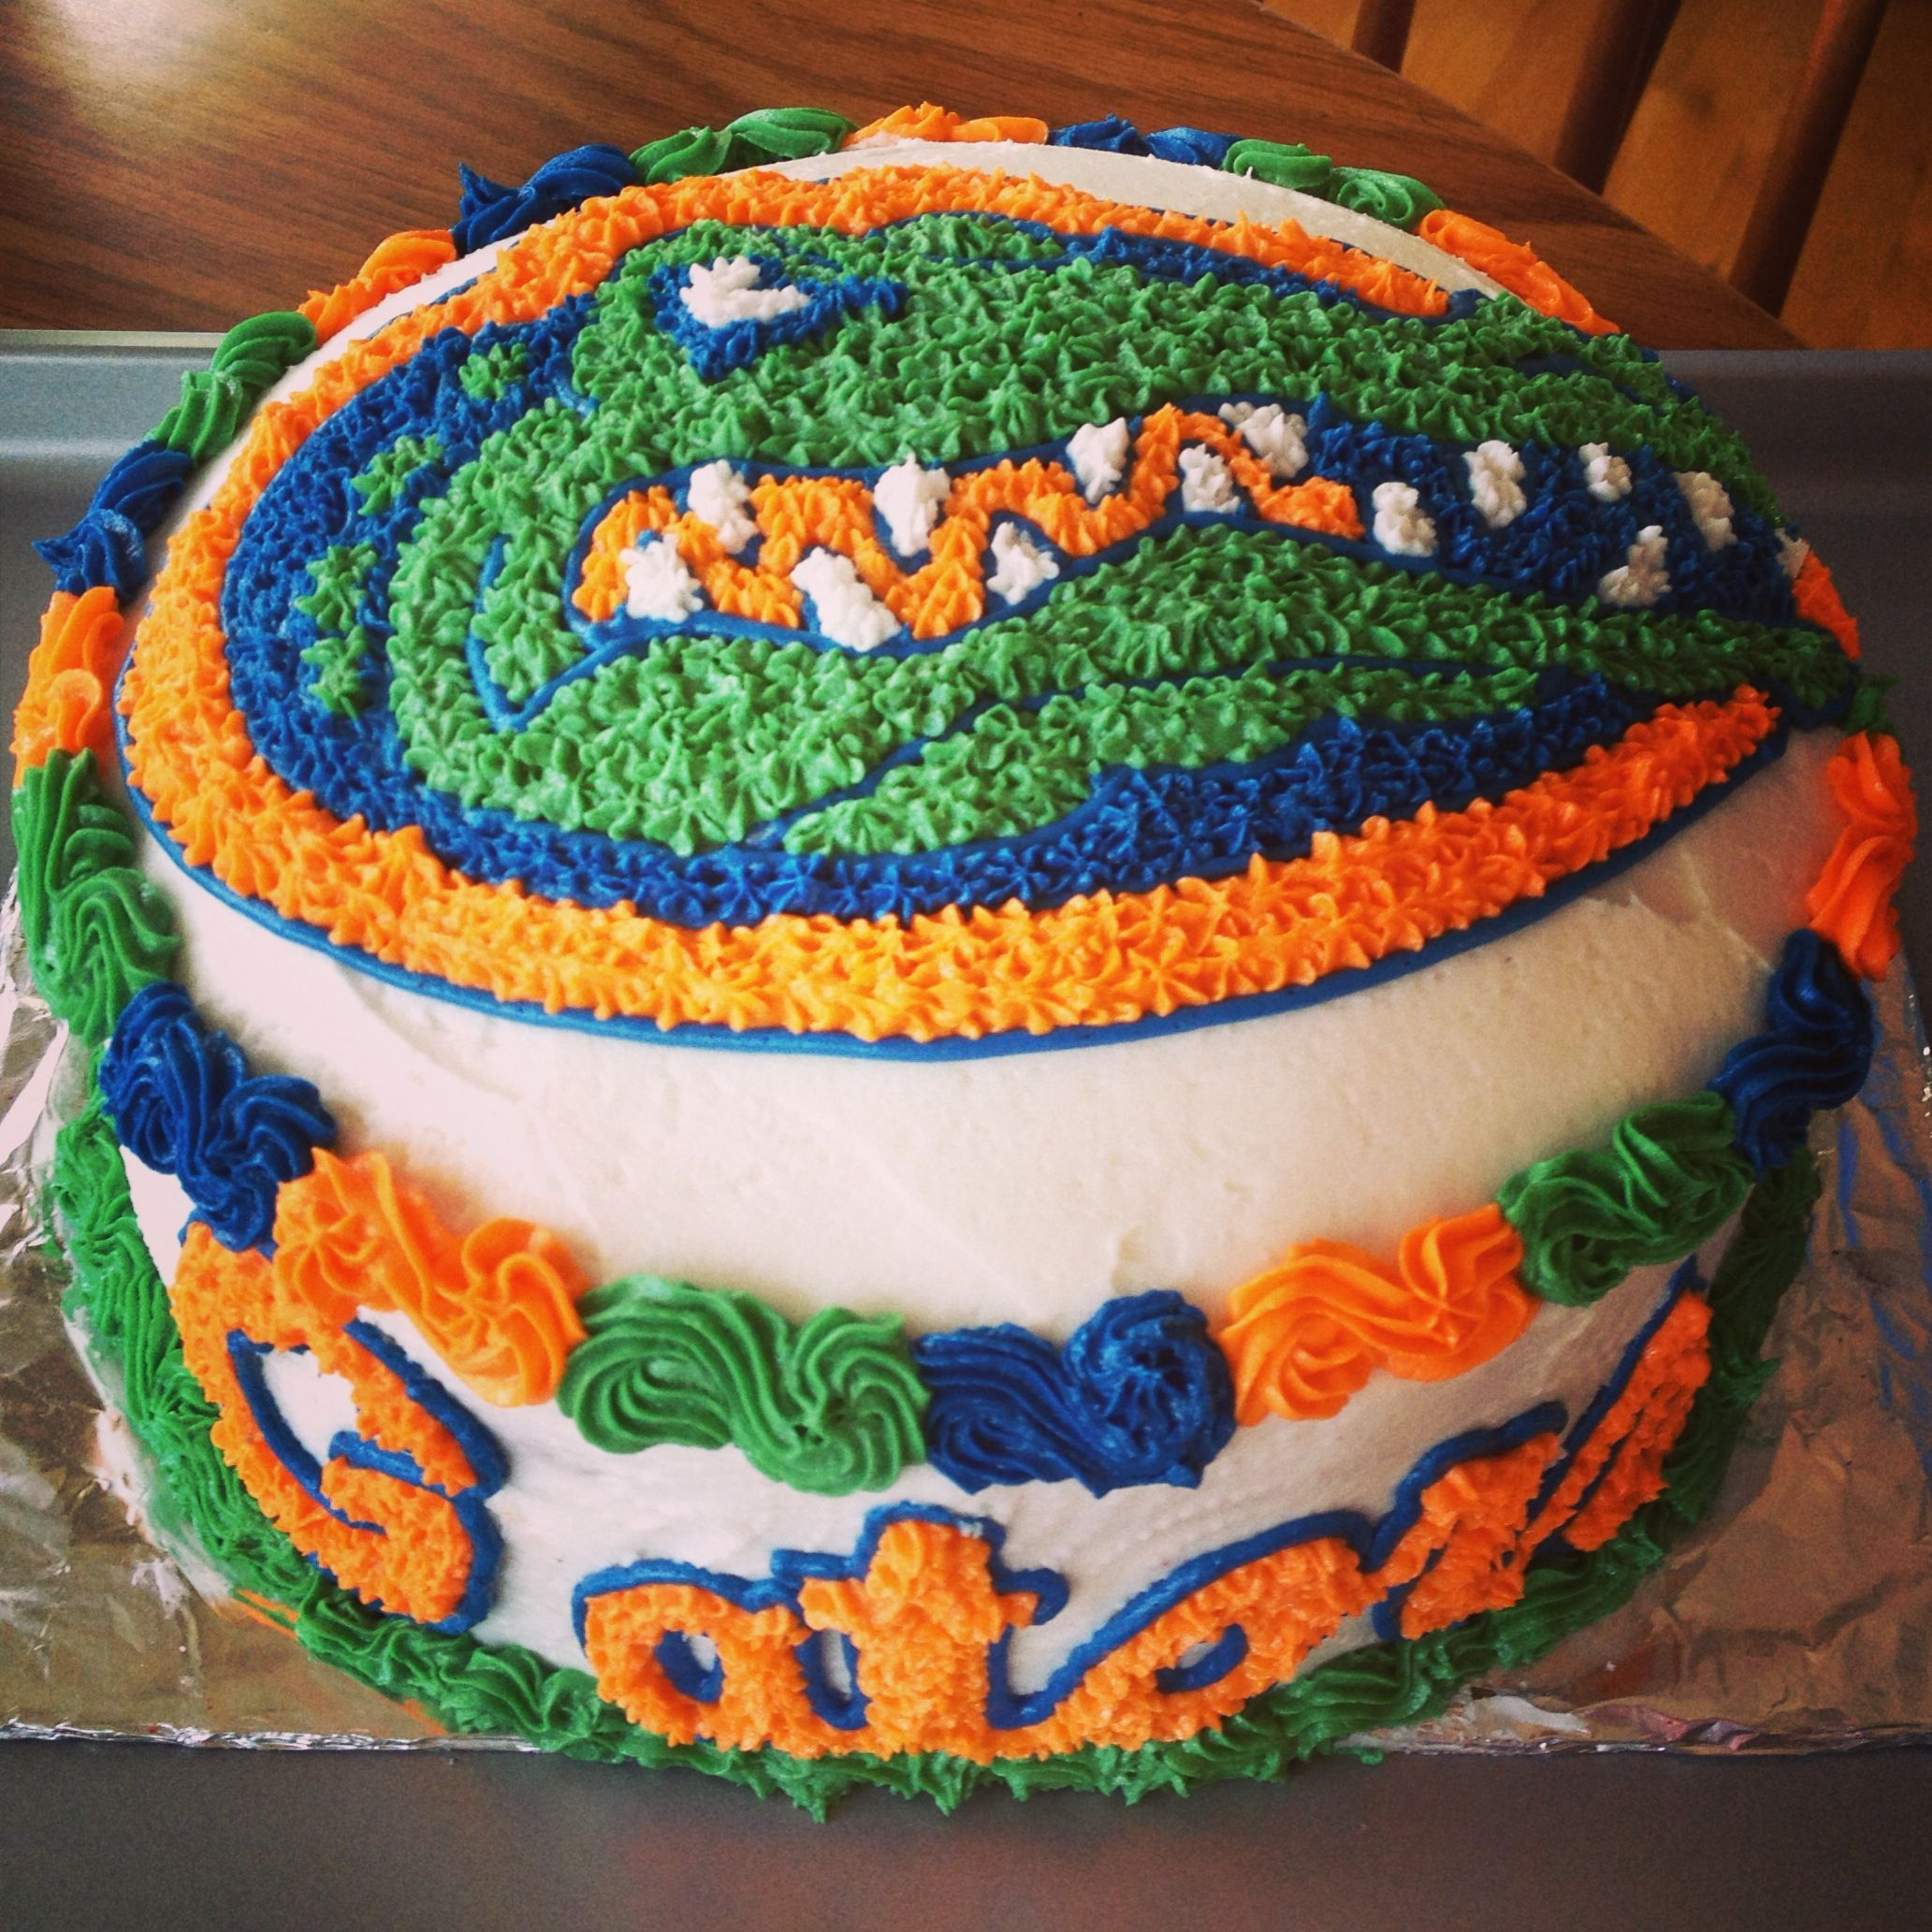 Florida Gators Cake My Cakescupcakescookies Pinterest Cake